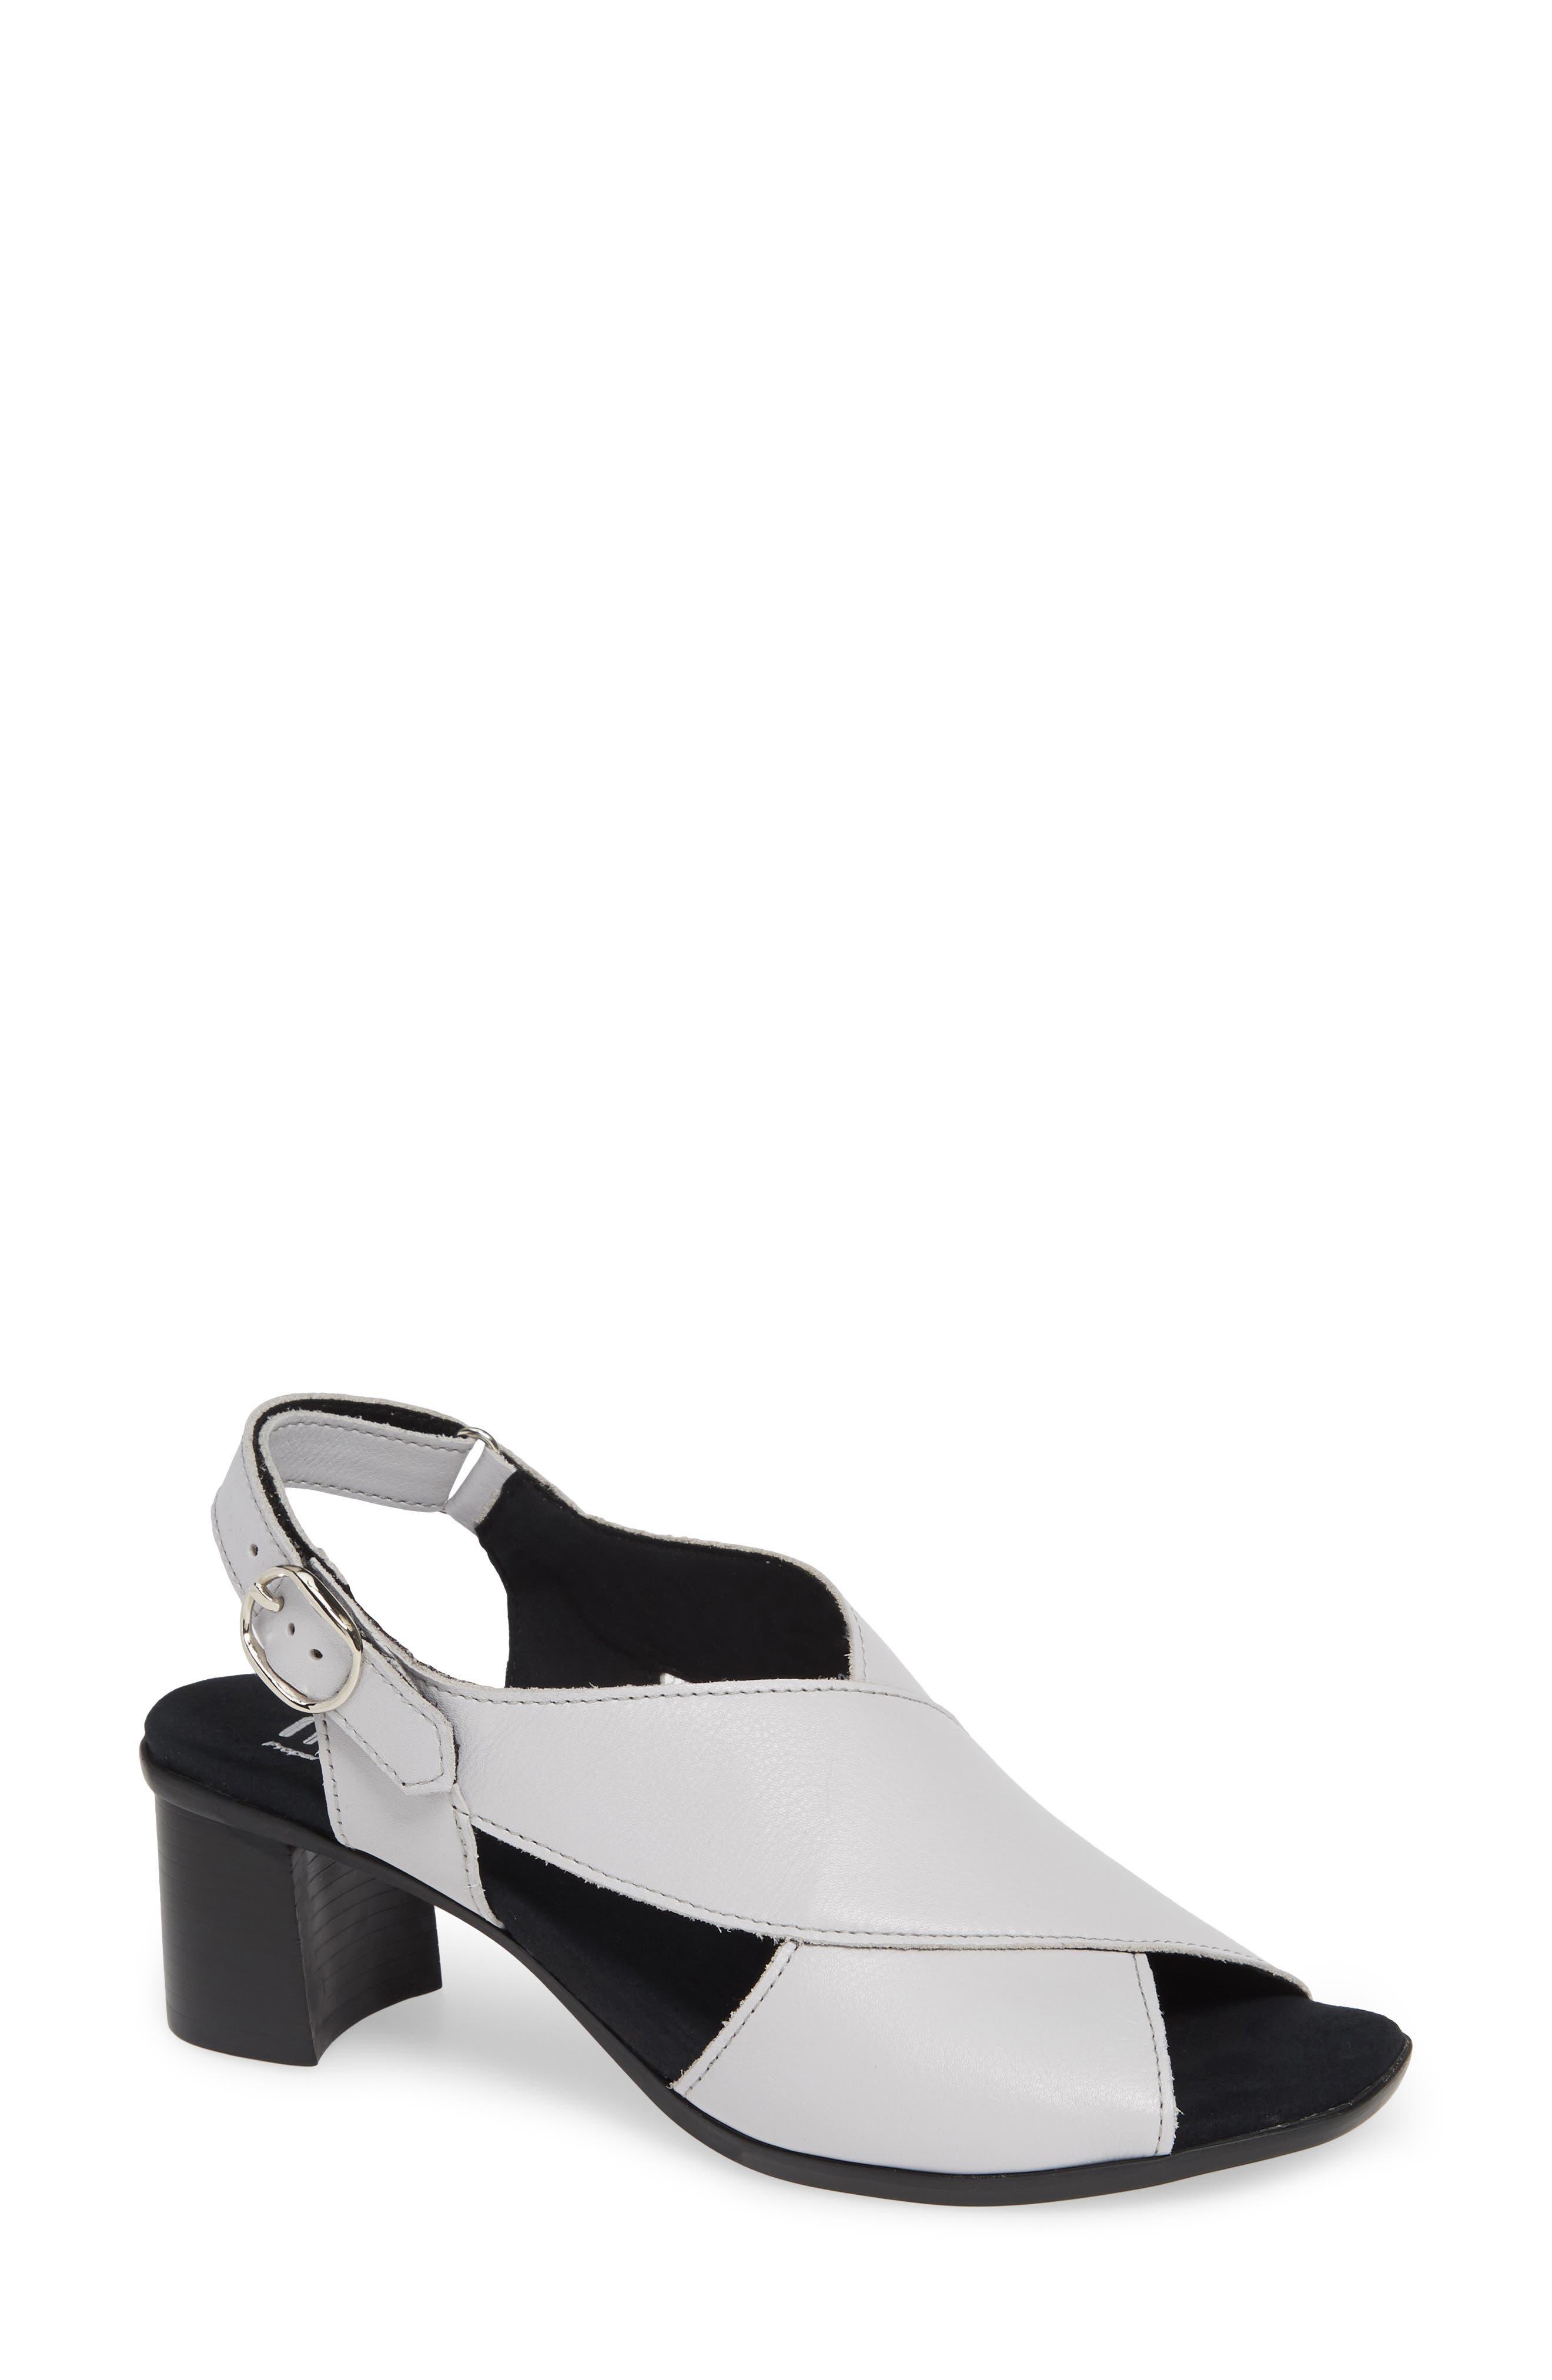 MUNRO, Laine Block Heel Sandal, Main thumbnail 1, color, WHITE LEATHER